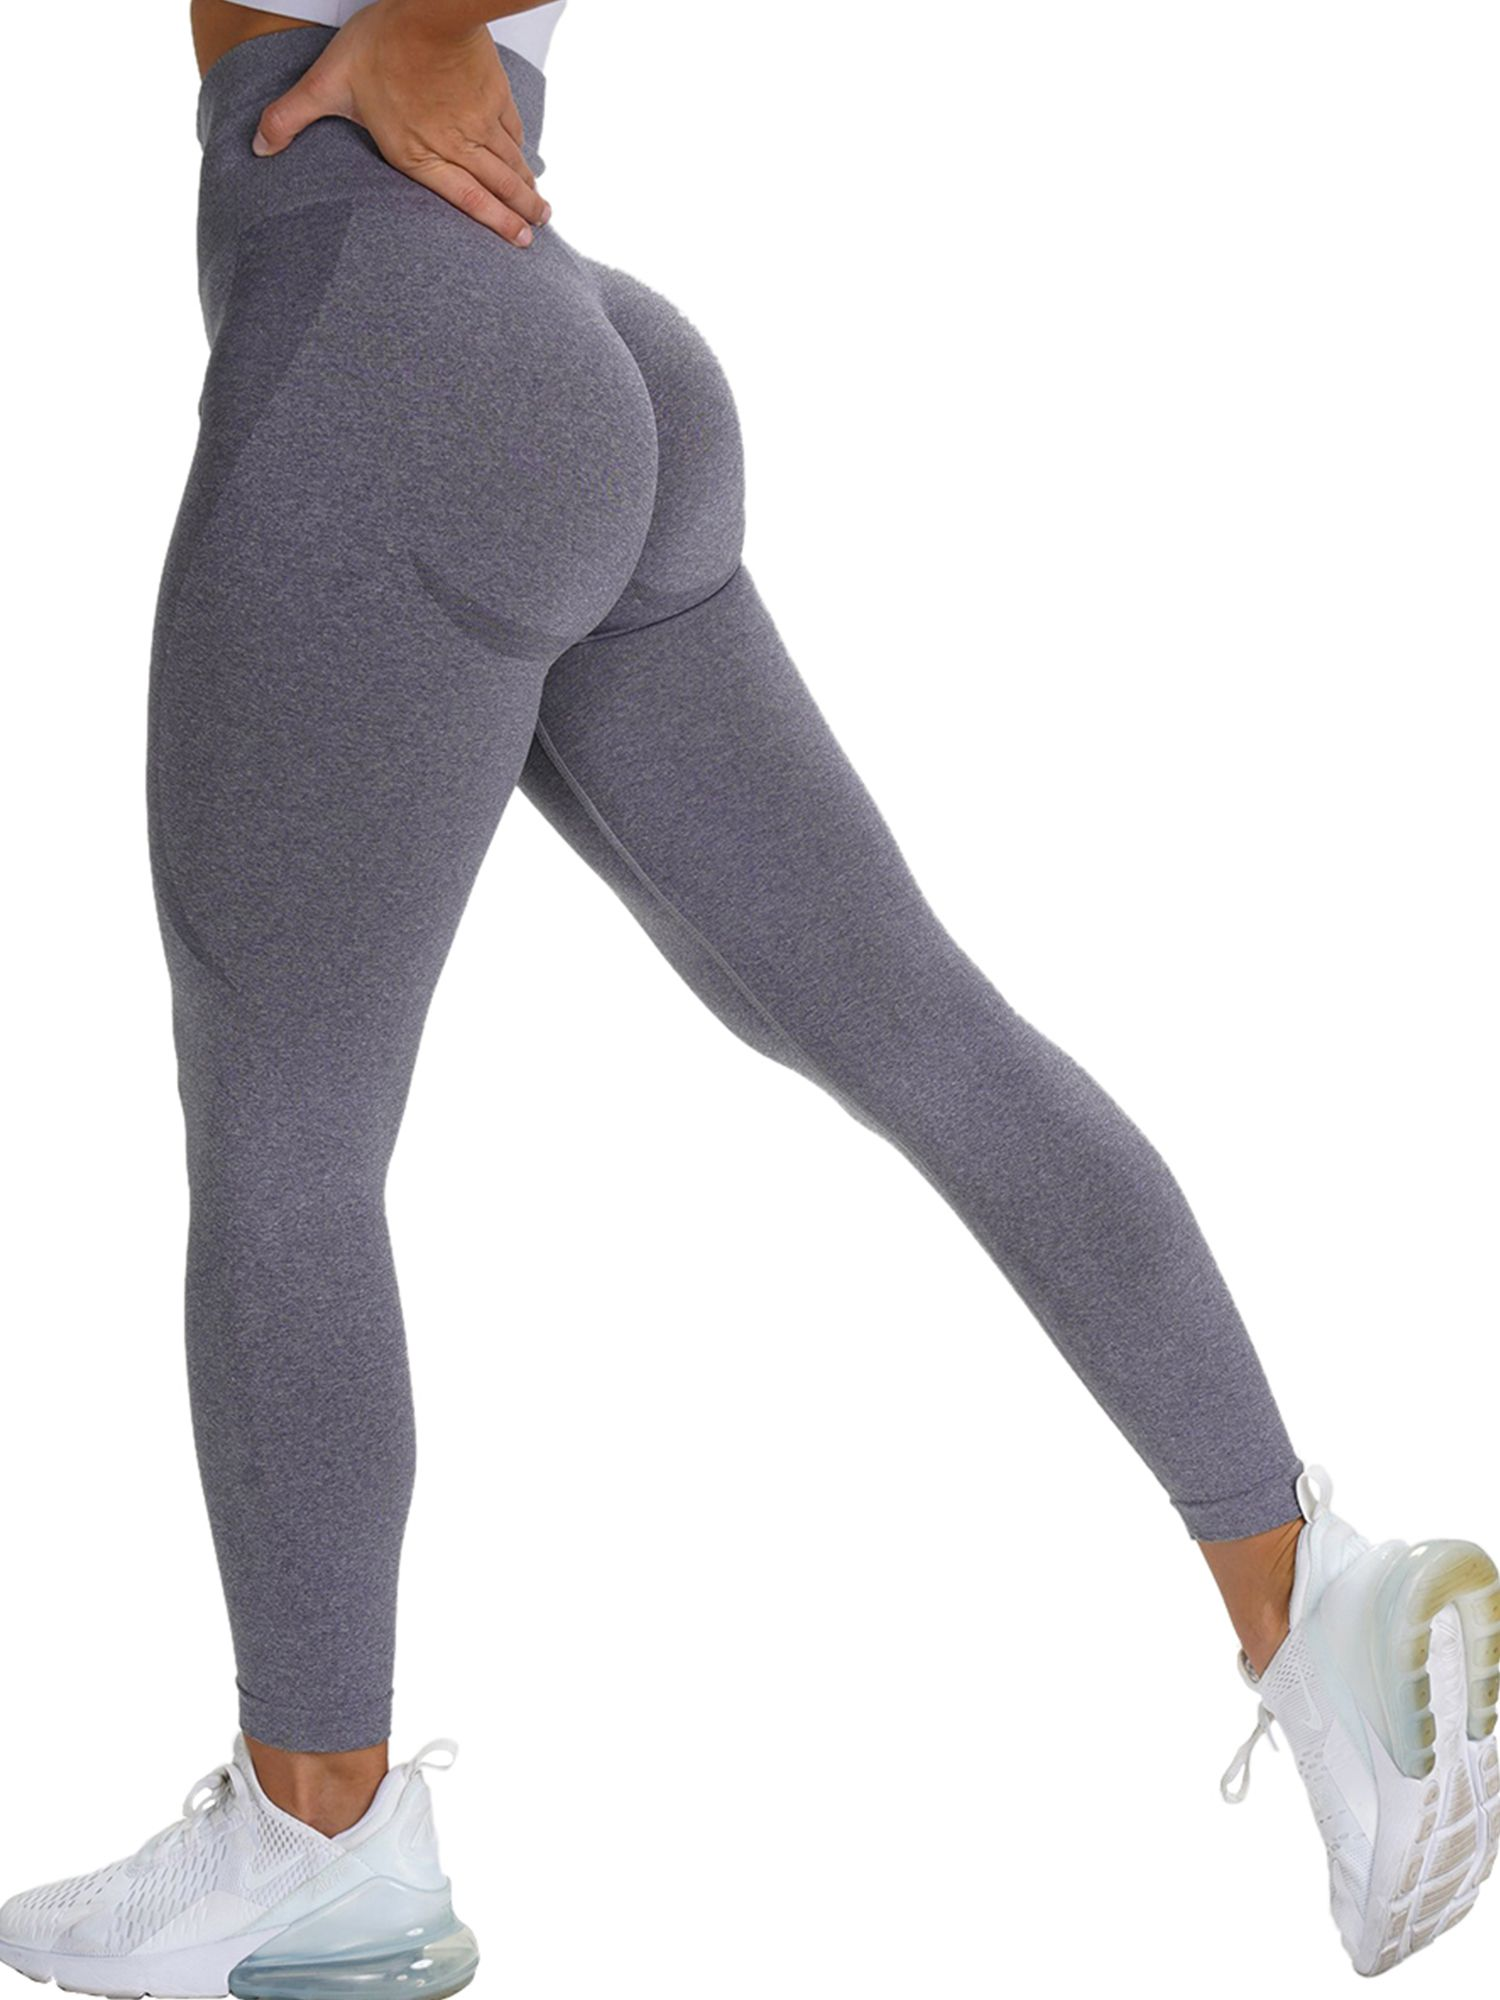 Womens High Waist Yoga Pants and Sports Bra Set Tummy Control Workout Running Stretch Sports Leggings